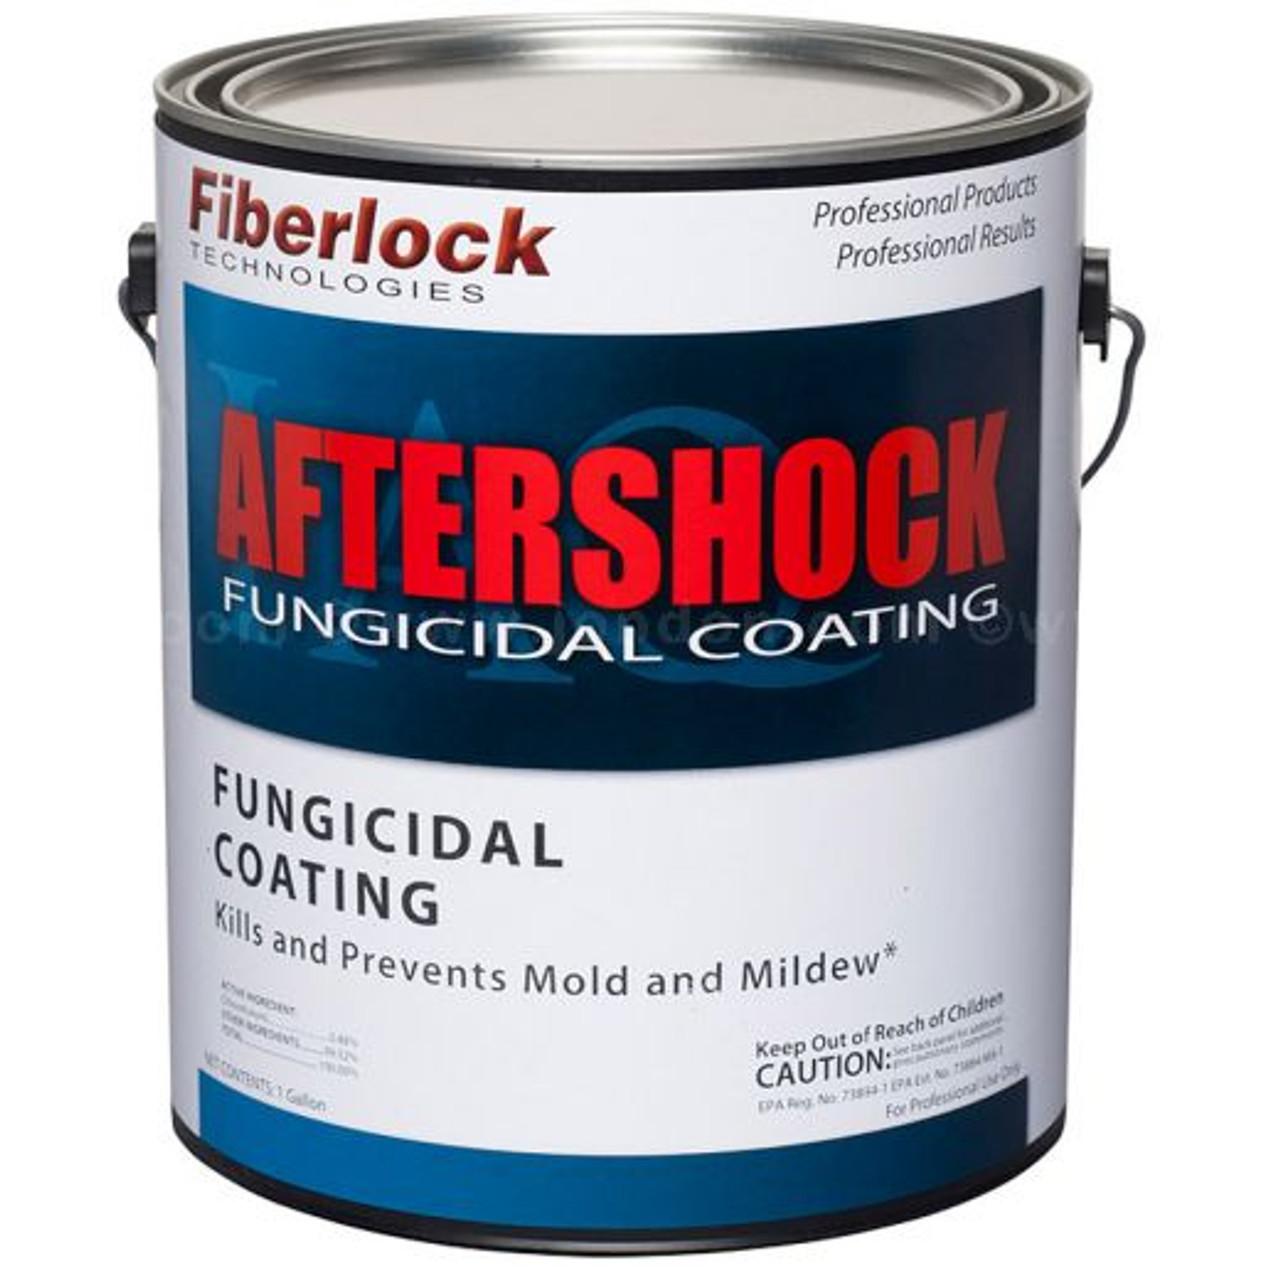 Aftershock Fungicdal Coating 1g